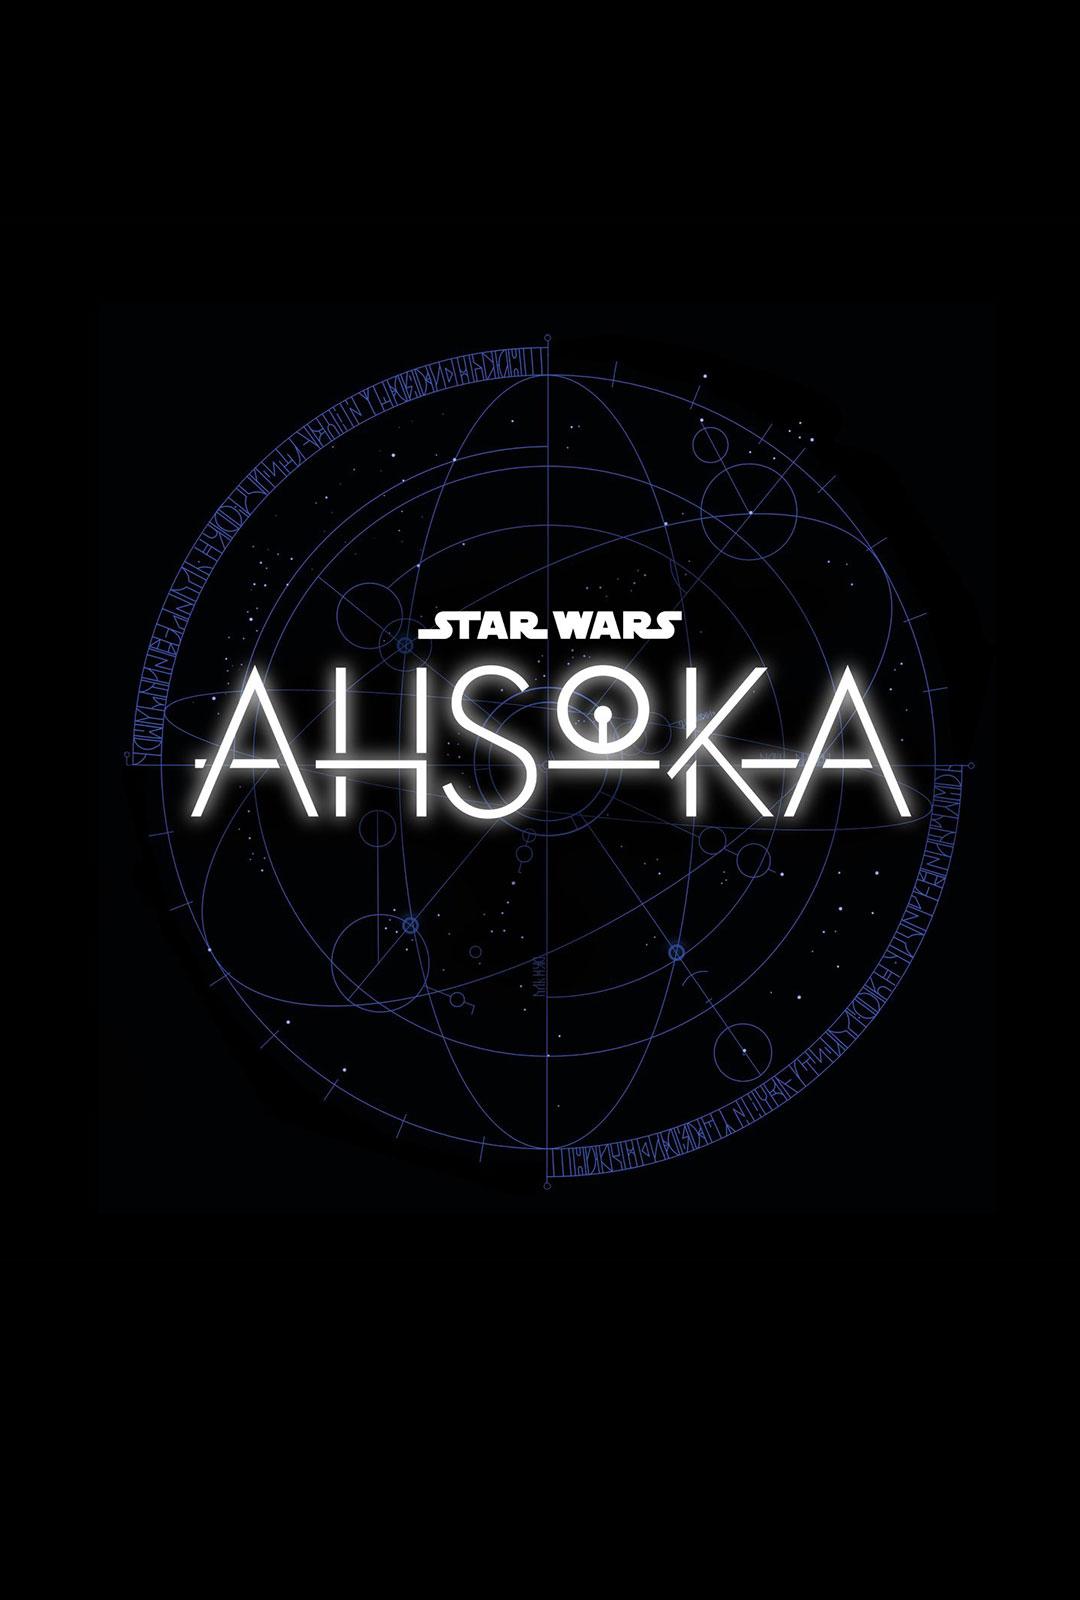 affiche poster ashoka star wars disney